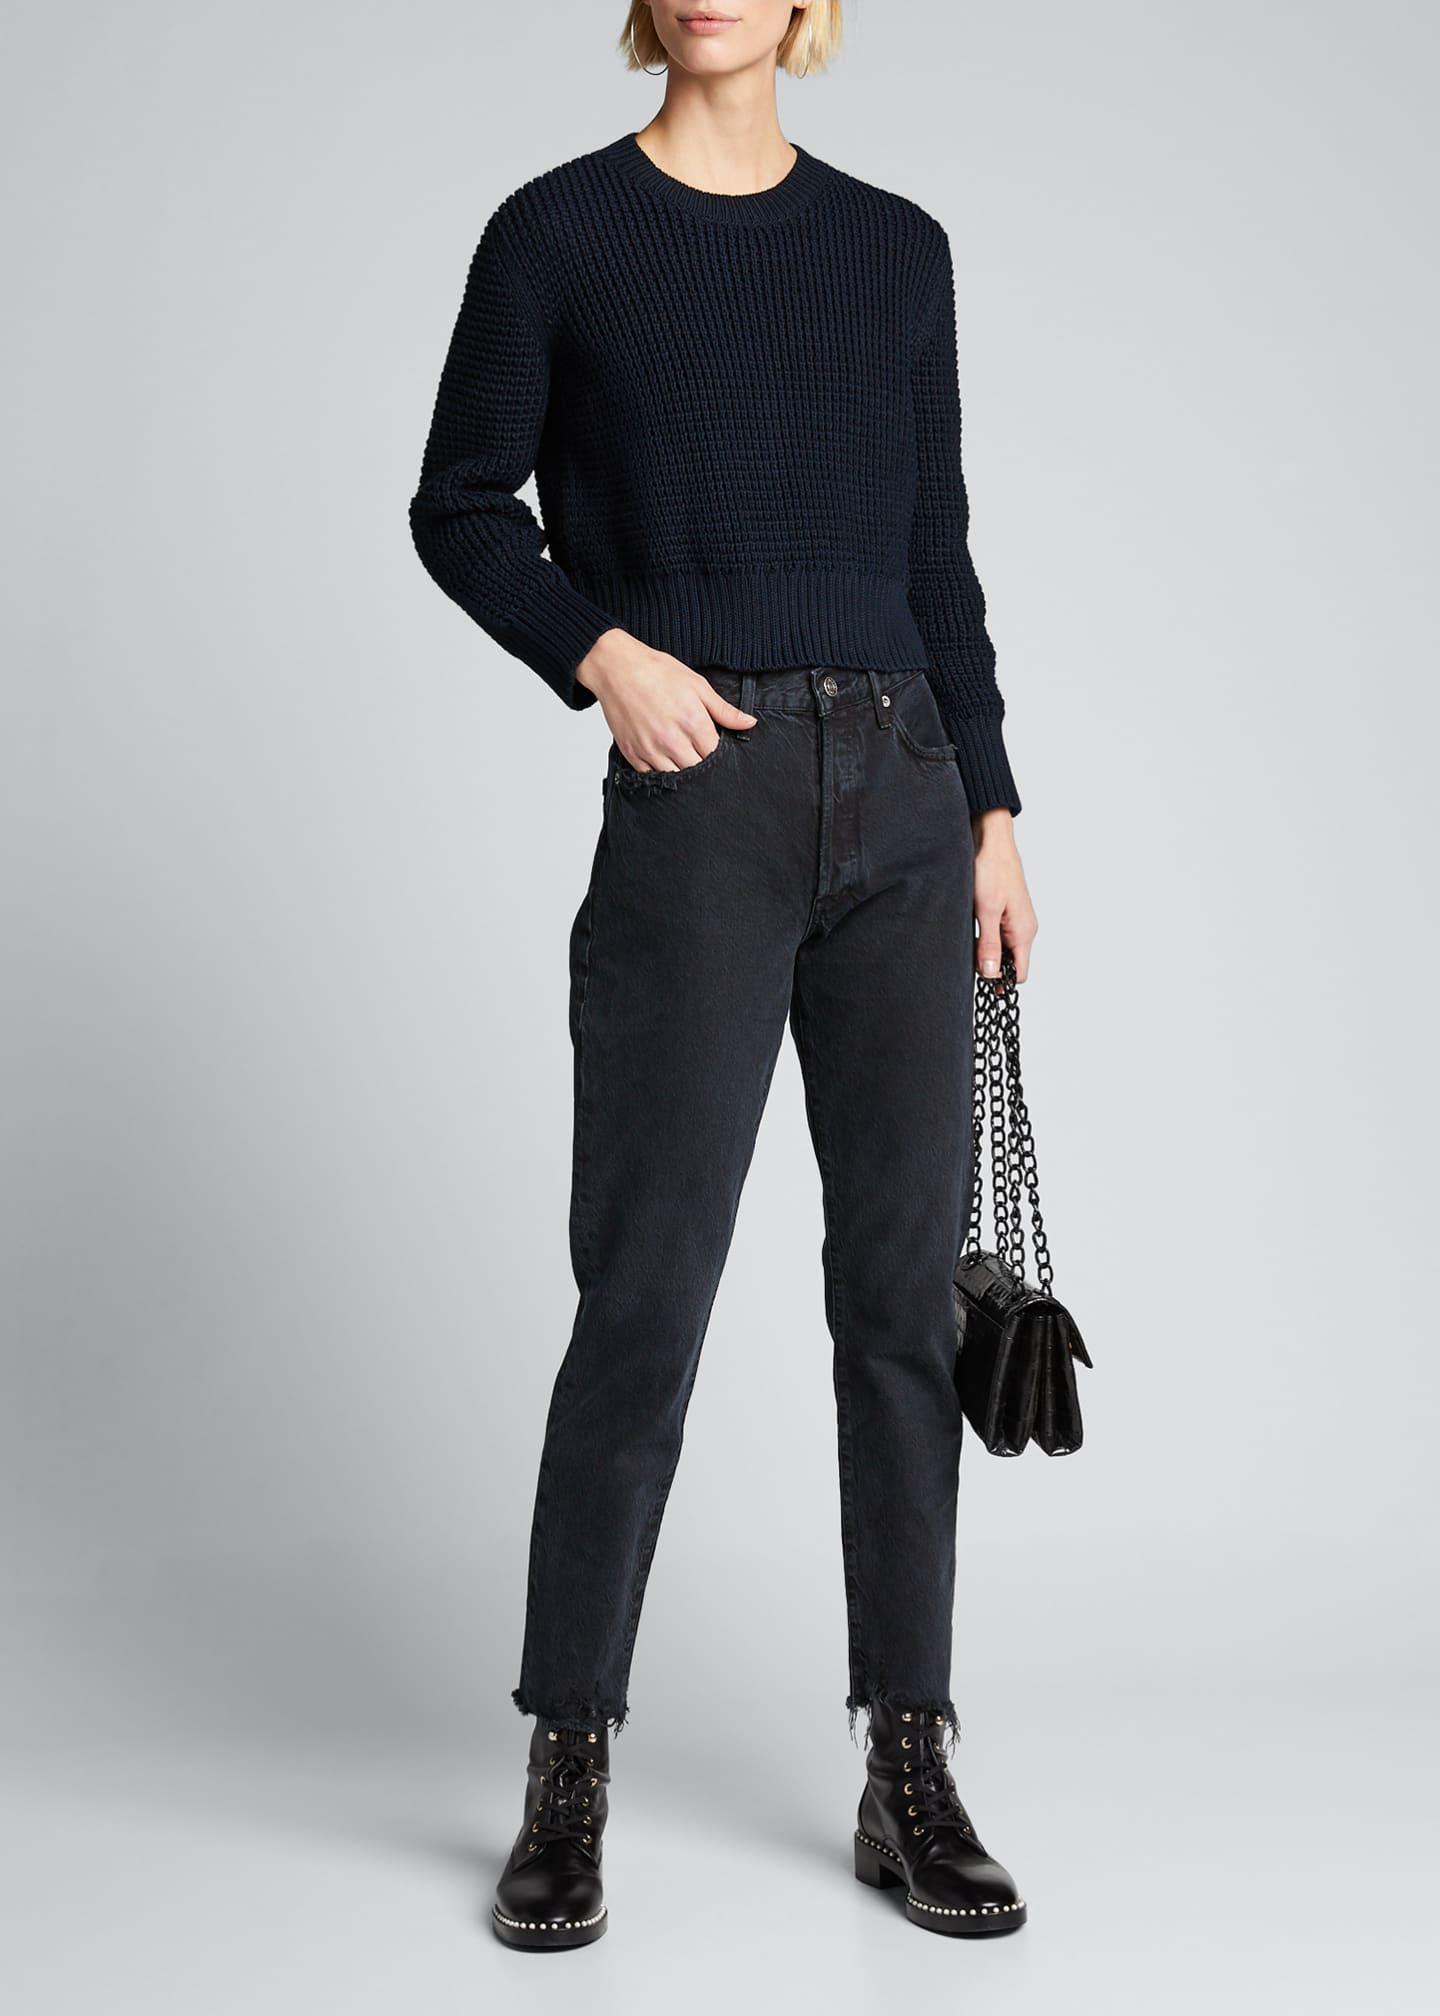 Rachel Comey Theorem Open-Back Cropped Pima Sweater